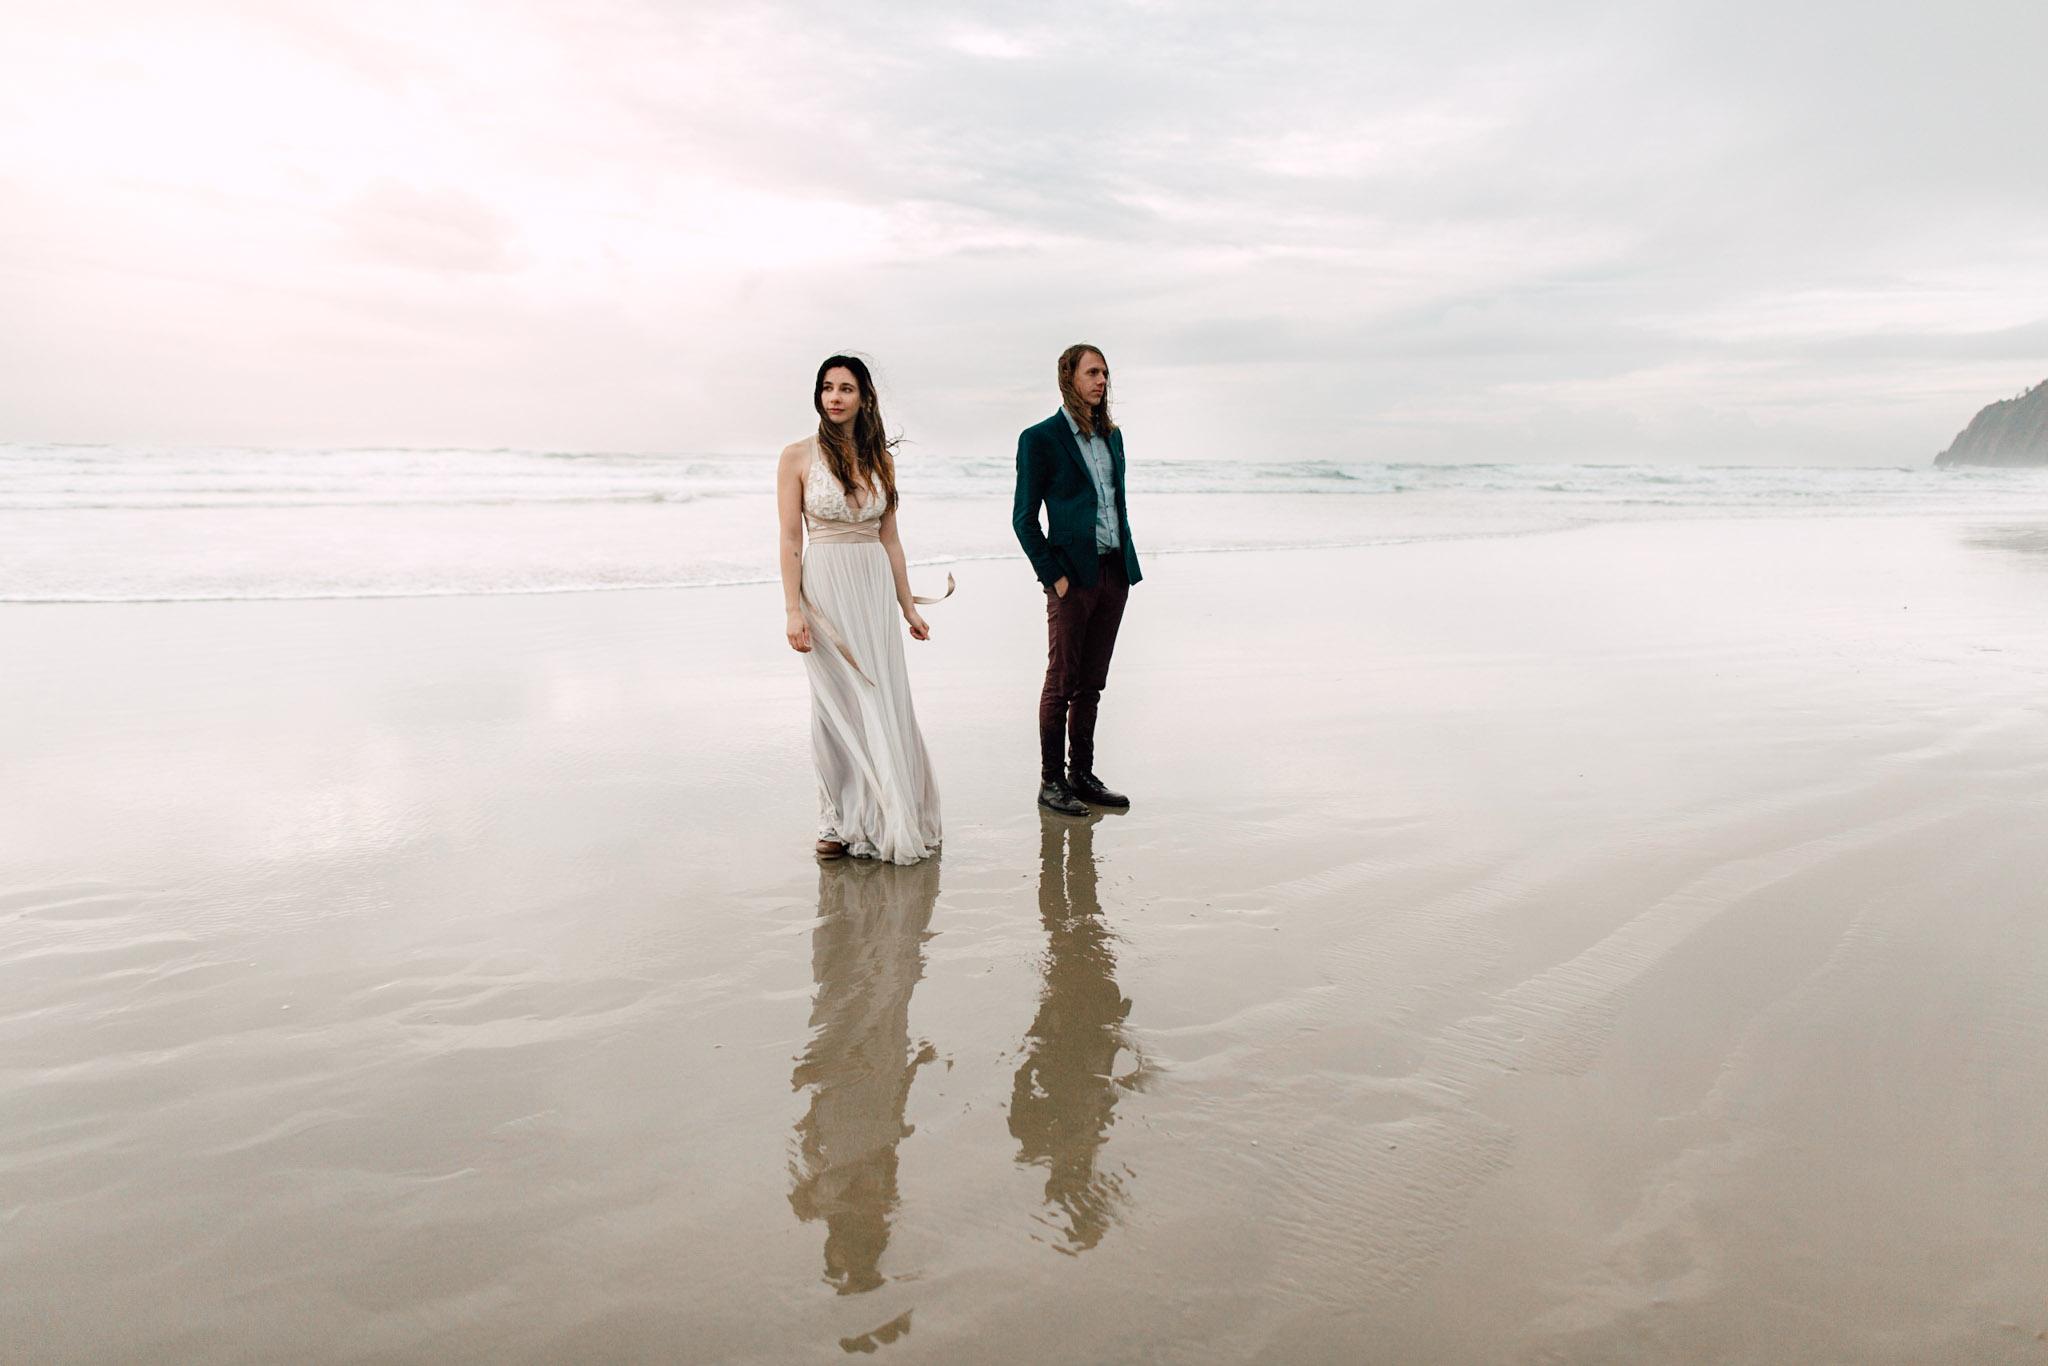 Oregon-Coast-Manzanita-Beach-Engagement-Pia-Anna-Christian-Wedding-Photography-PNW-GB-23.jpg